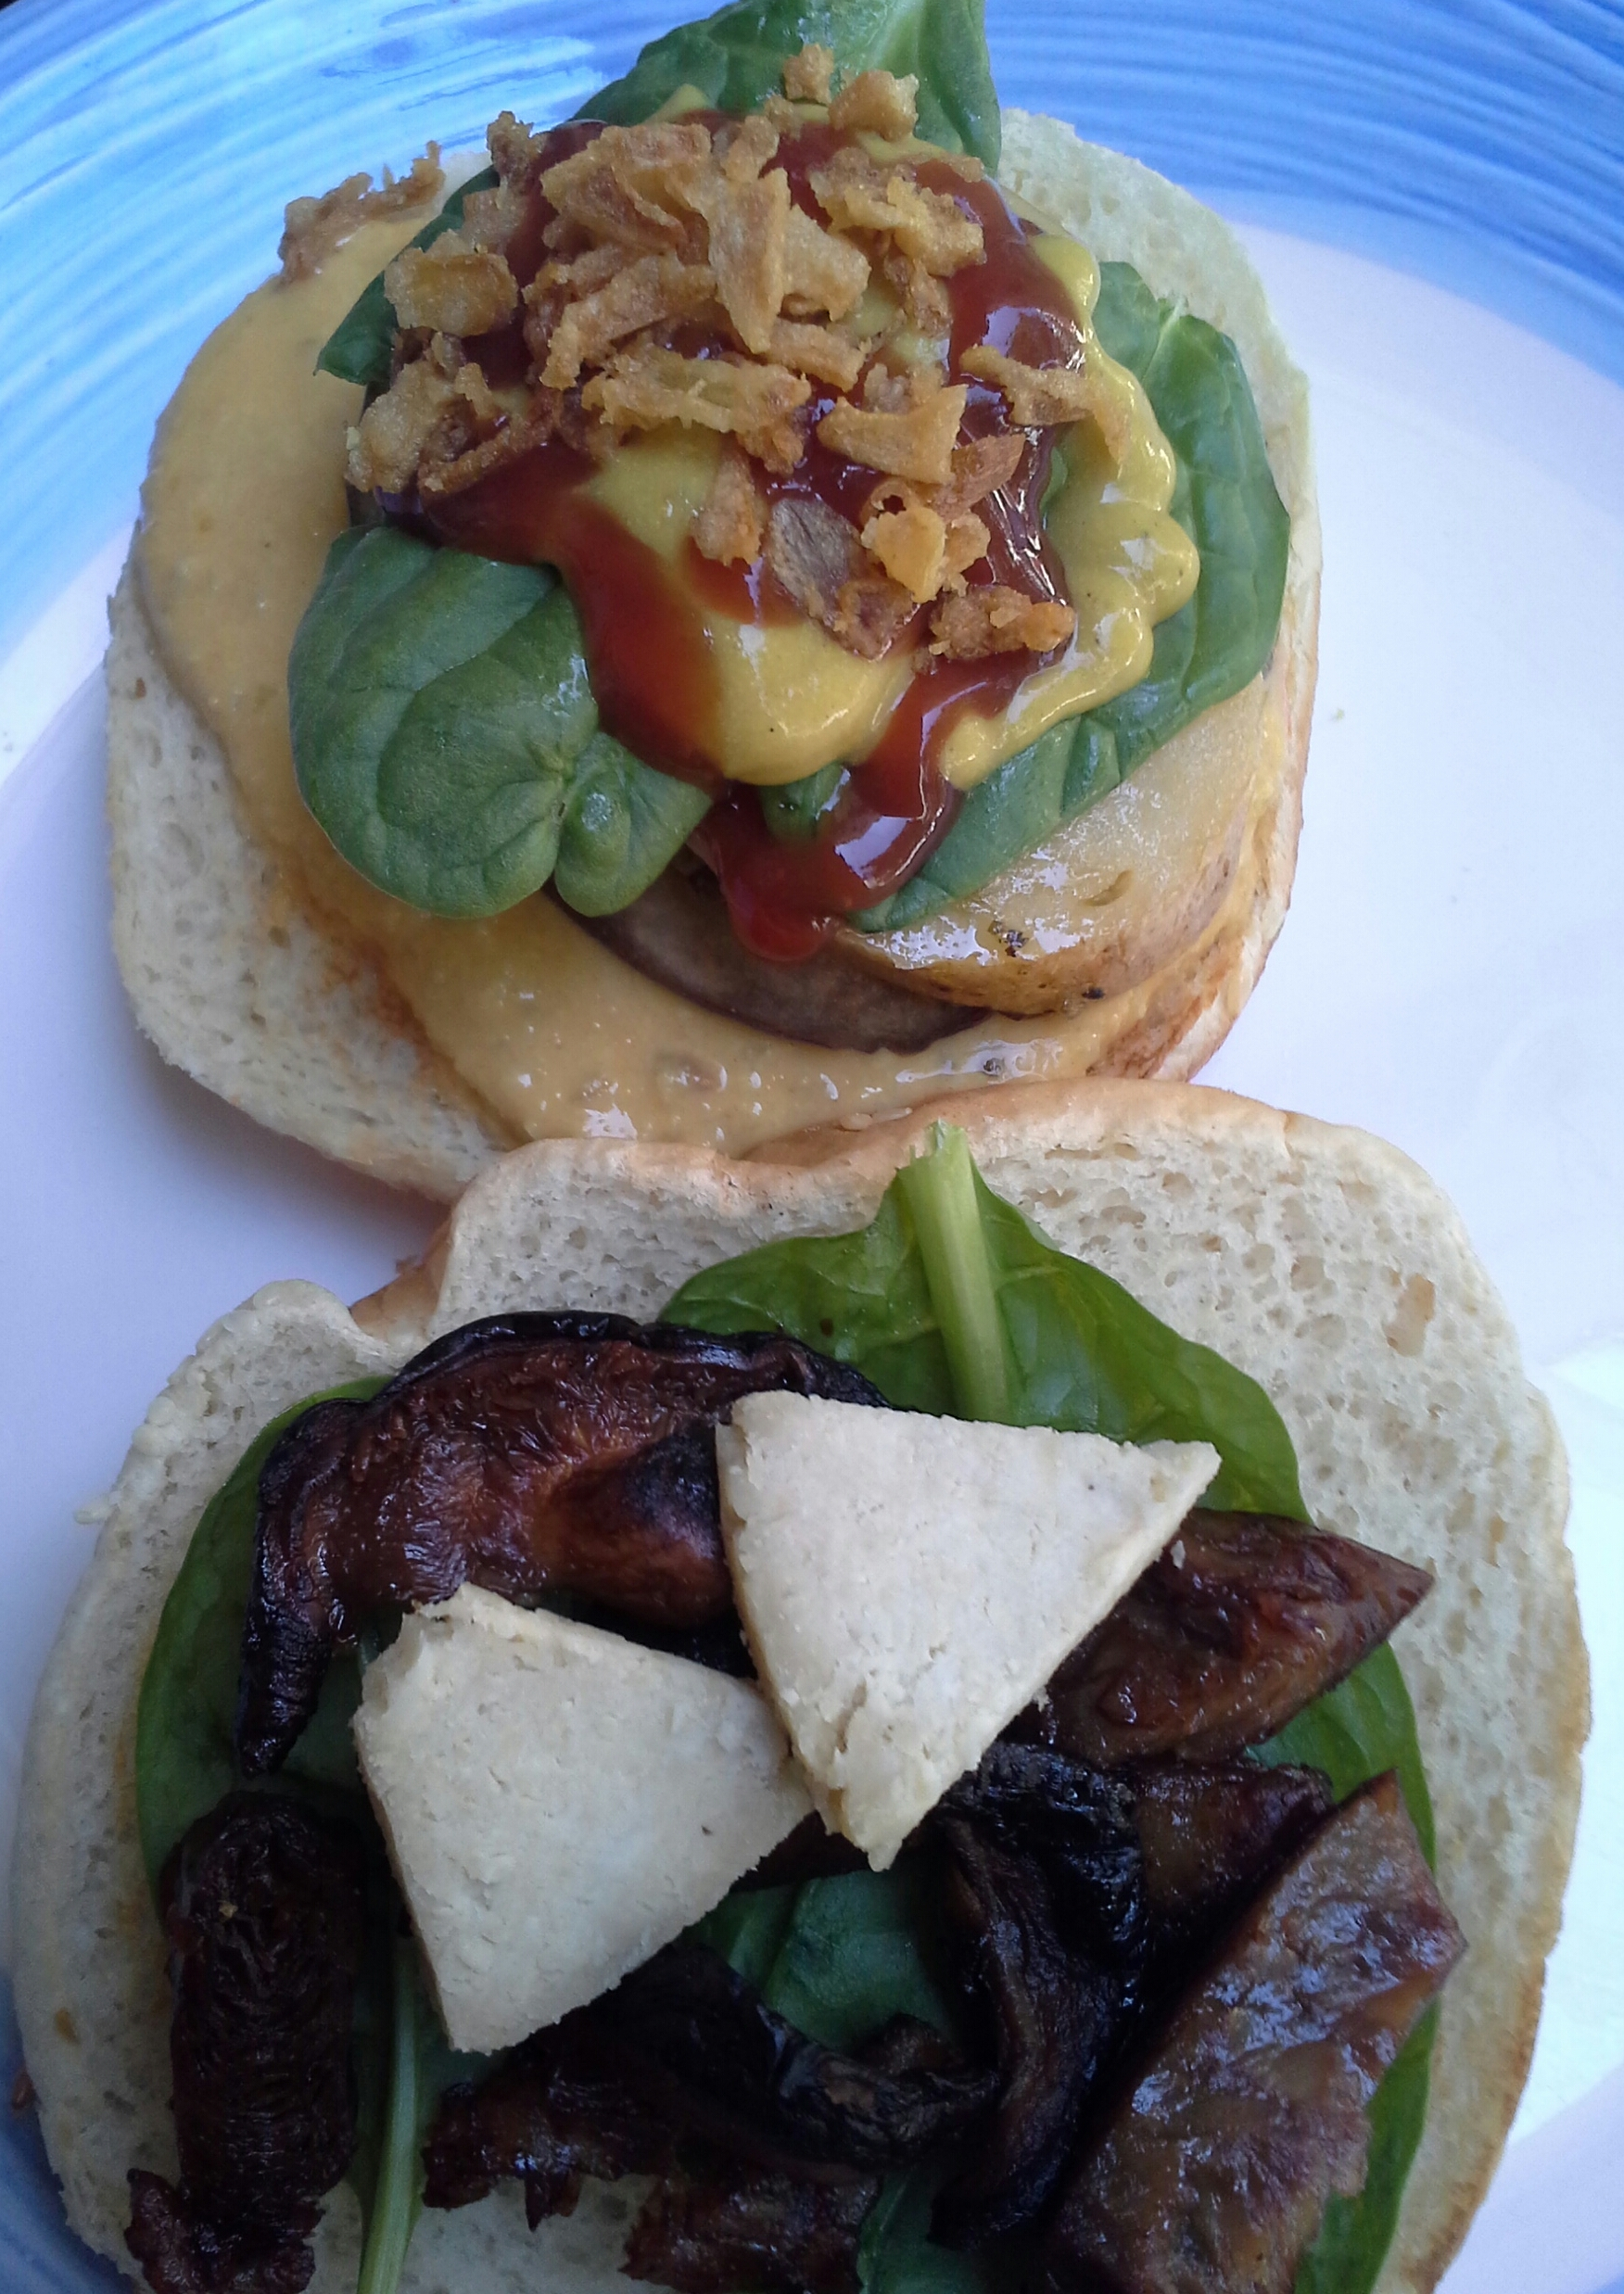 hamburguesadeshitakepatataberenjenayalipiolin